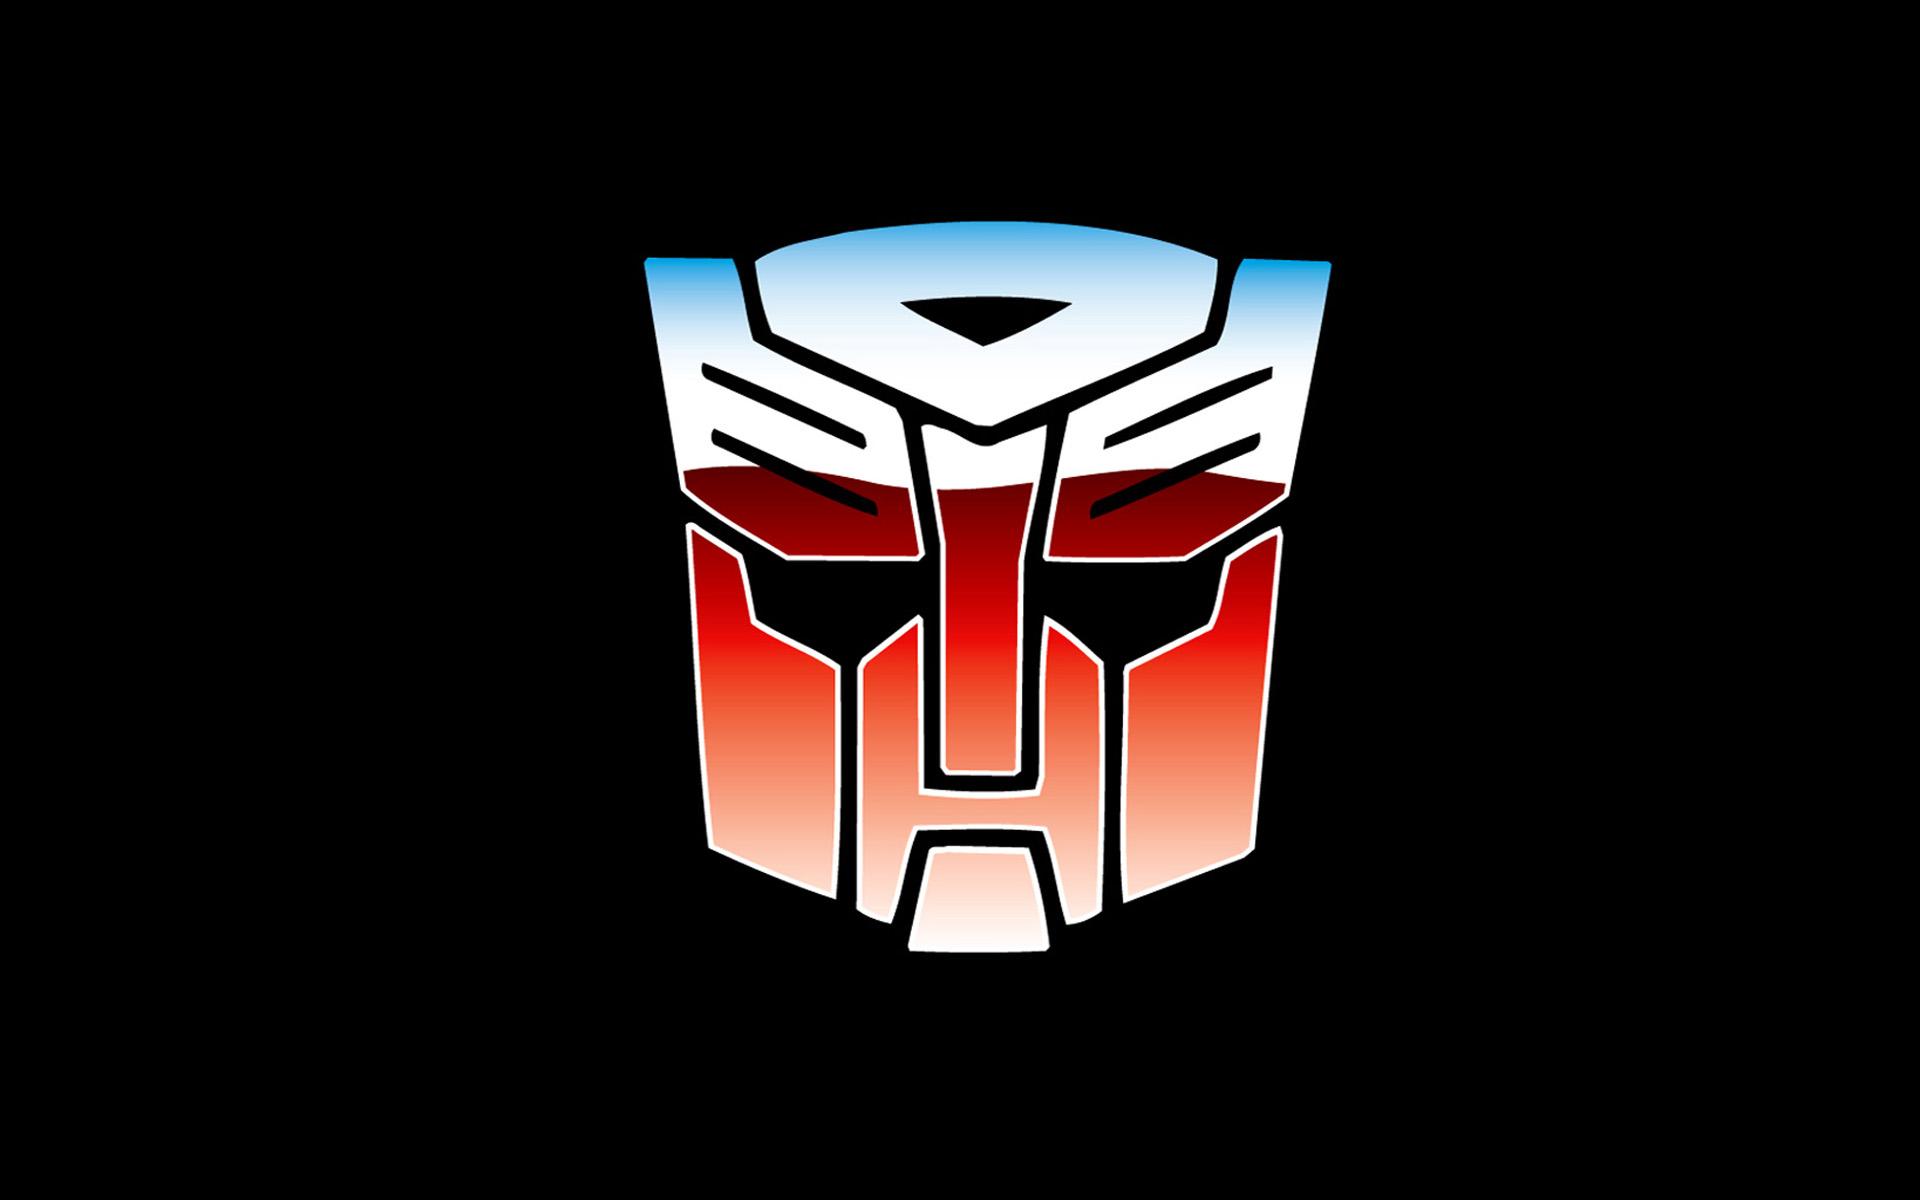 autobot logo wallpaperjpg 1920x1200